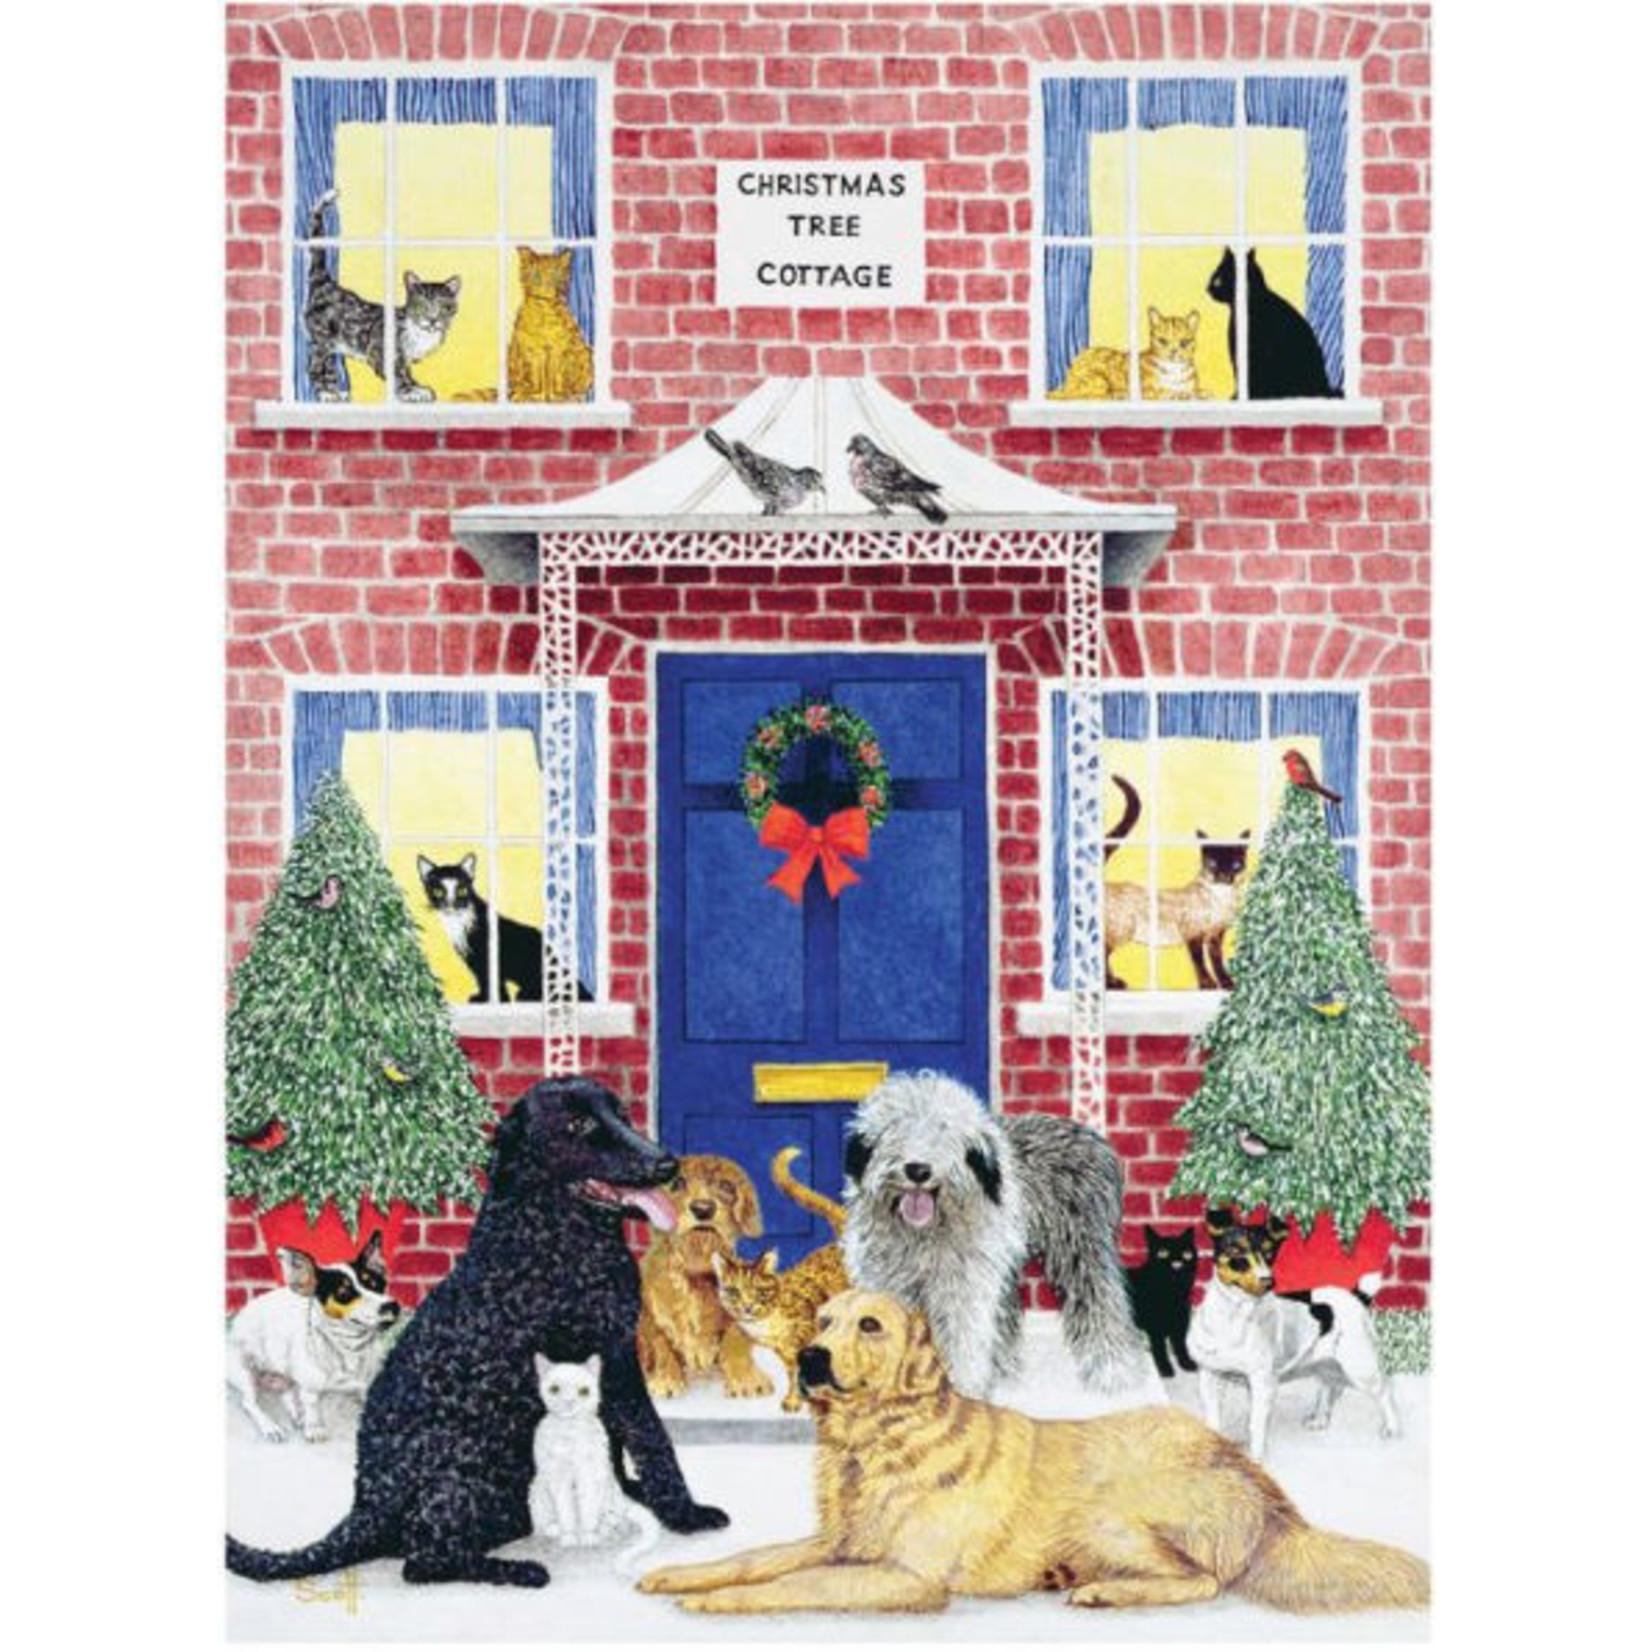 CHRONICLE CHRISTMAS COTTAGE PUZZLE